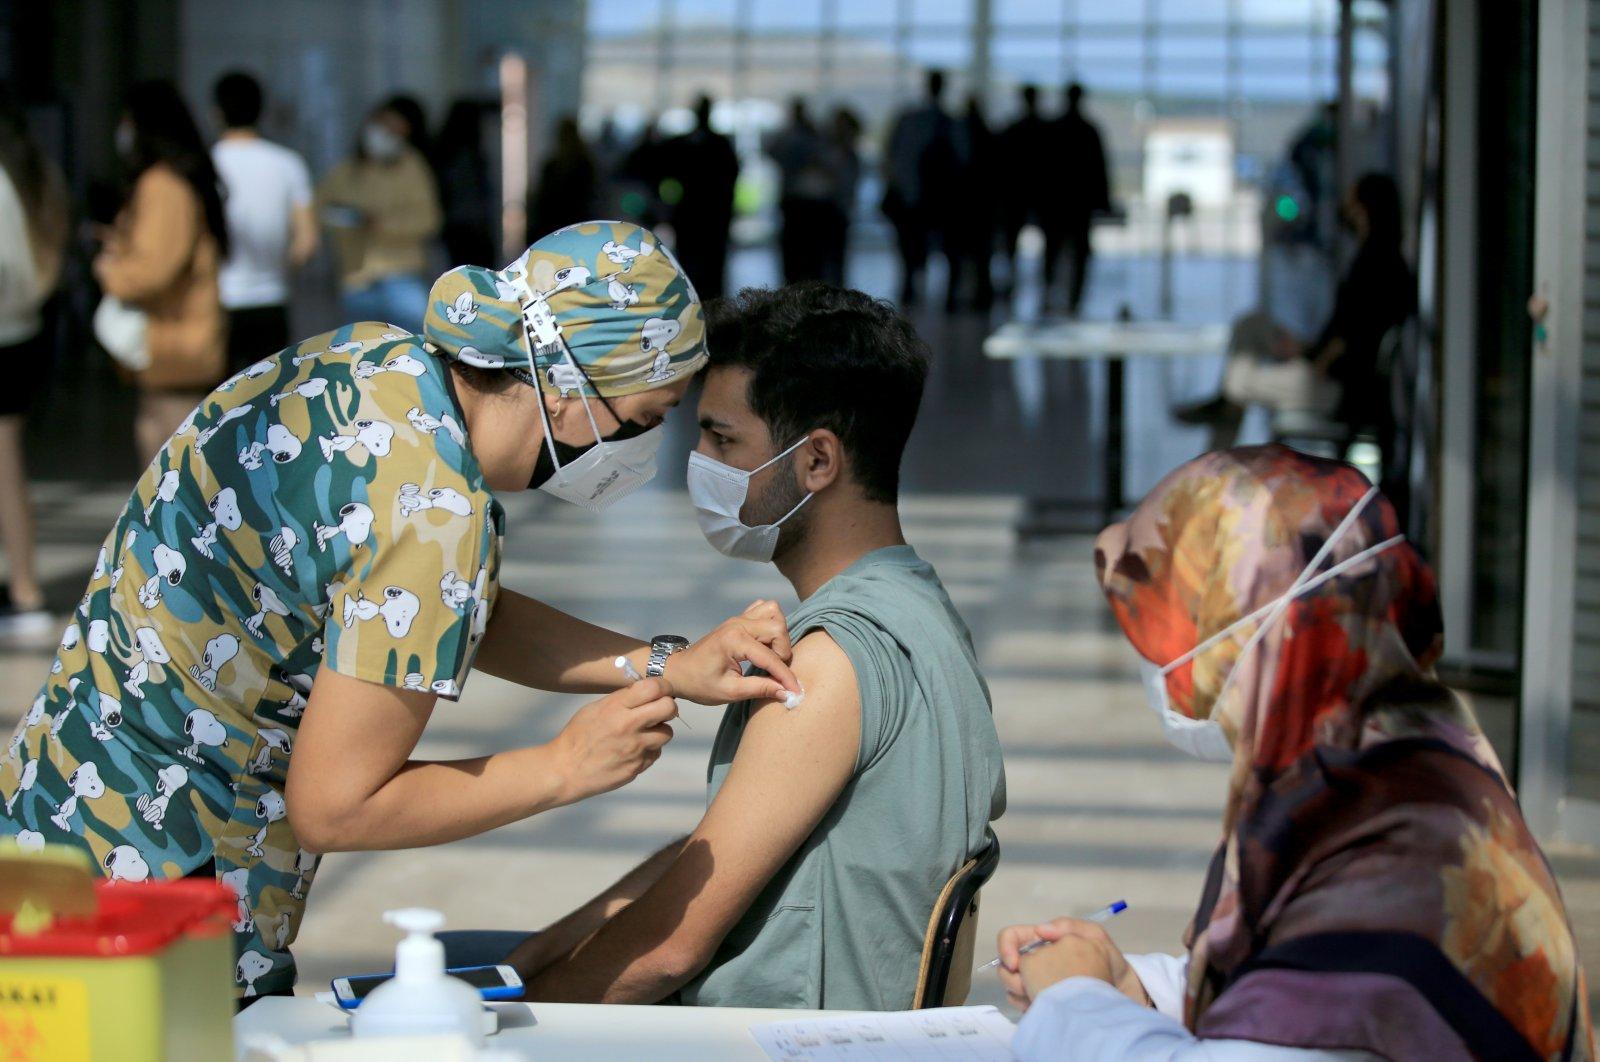 Barış Kaya, a student, gets vaccinated at a university campus in Kırklareli, northwestern Turkey, Oct. 5, 2021. (AA PHOTO)